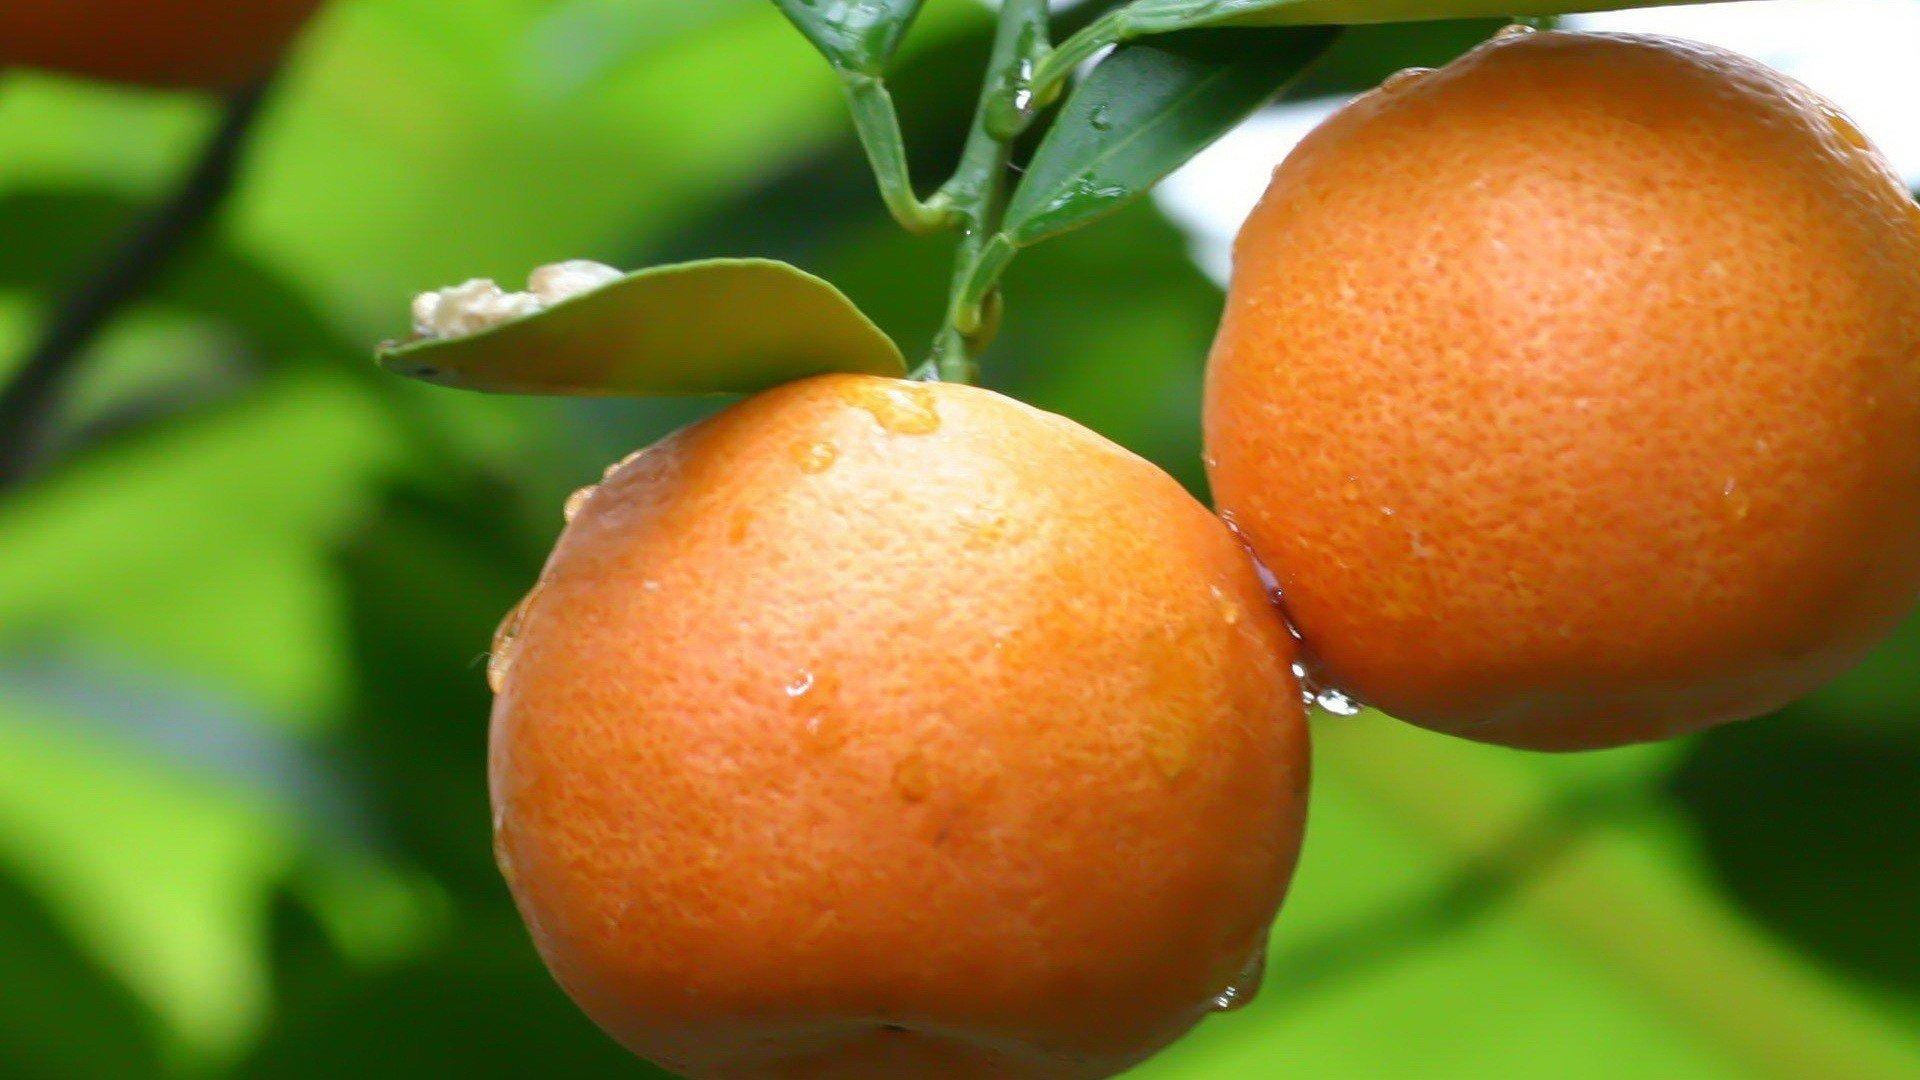 Nature Fruits Oranges Water Drops Wallpaper